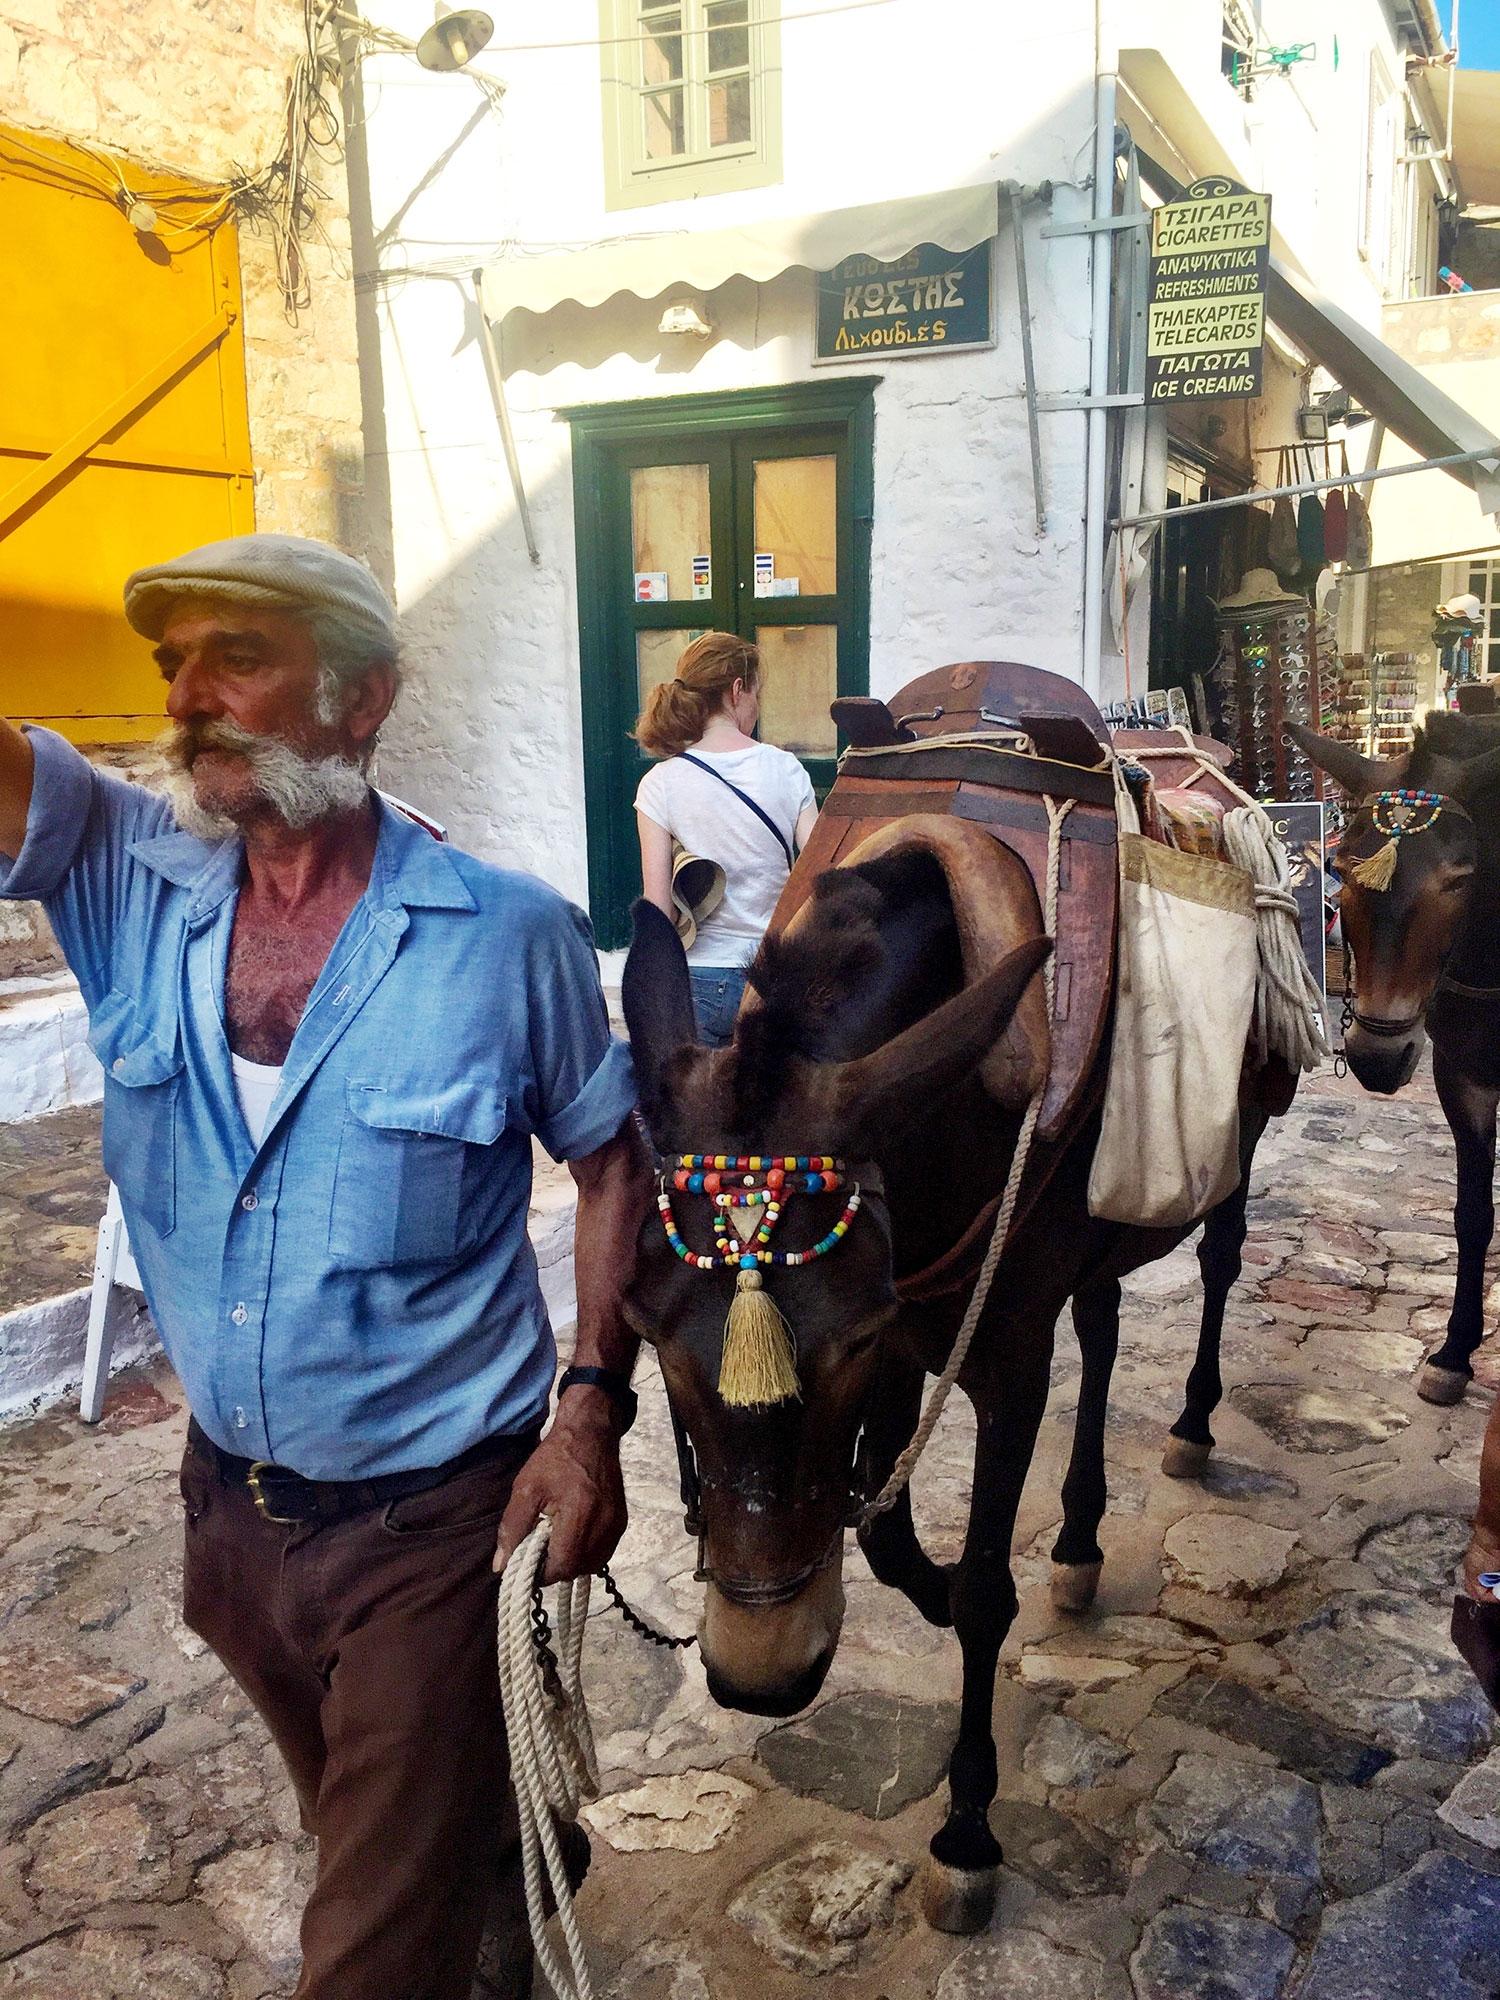 A Greek man walks his pack donkeys through the streets of Hydra